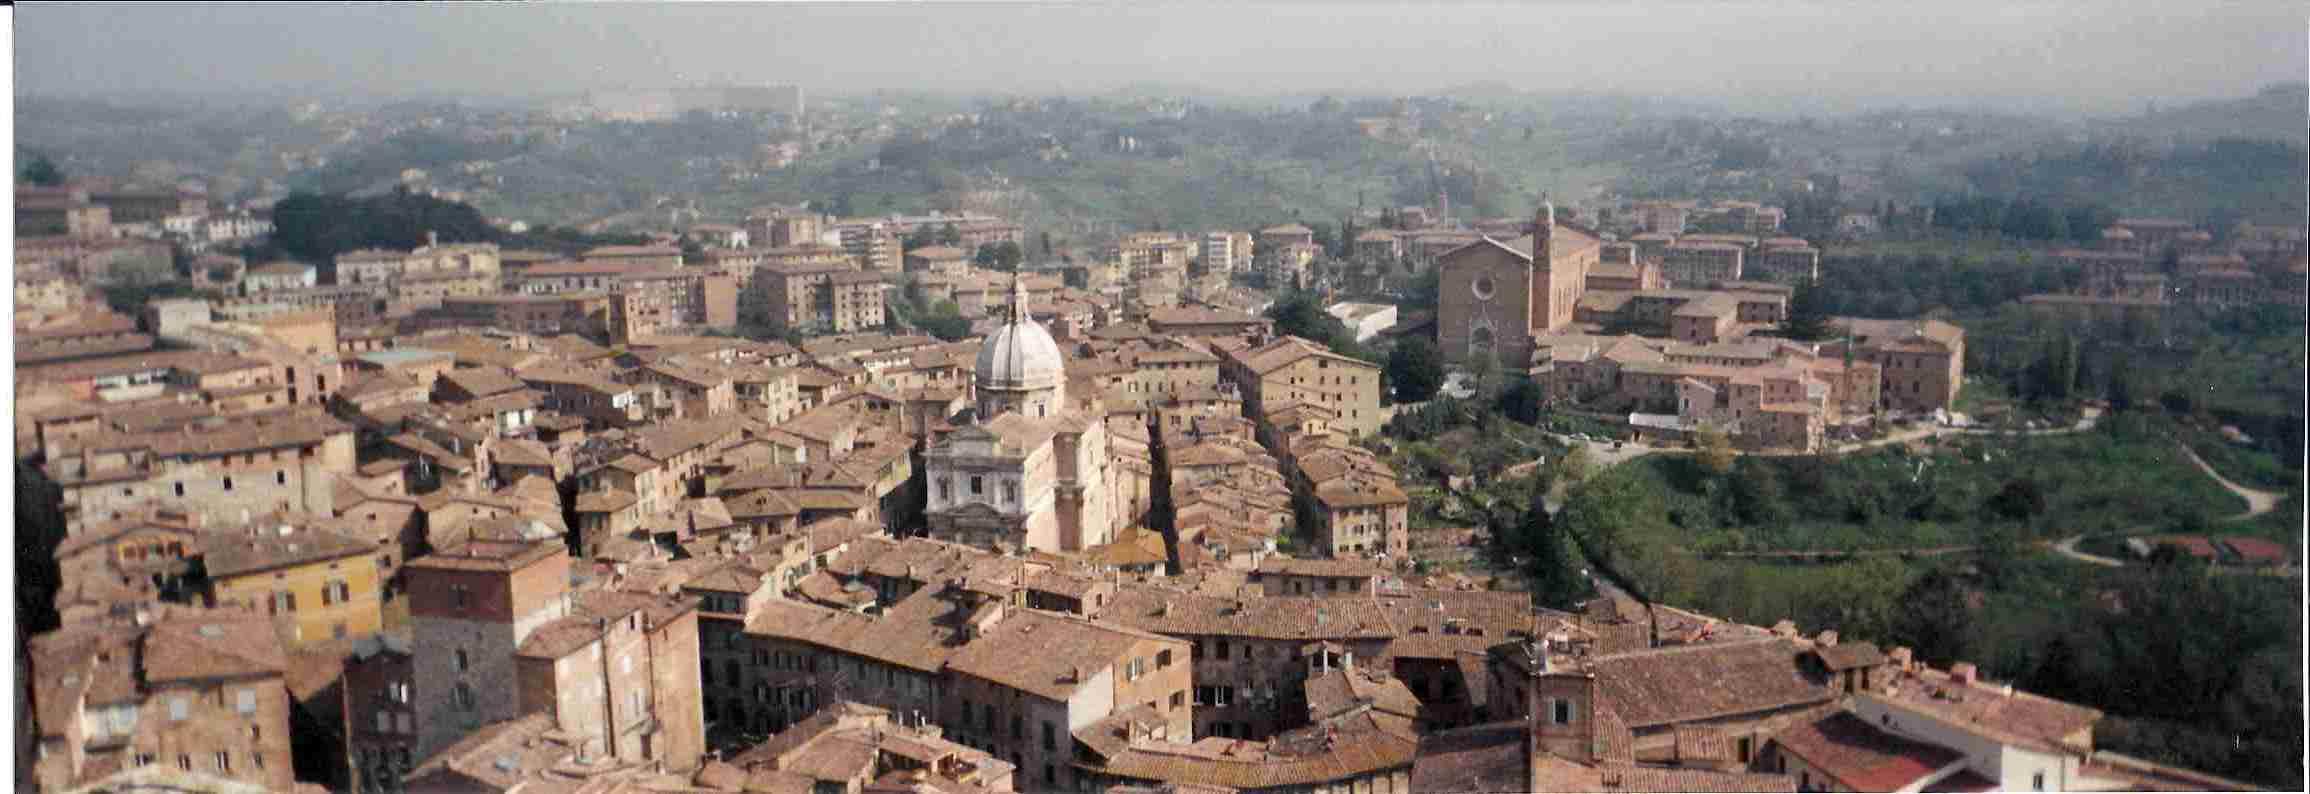 2000 Europe Sienna Italy